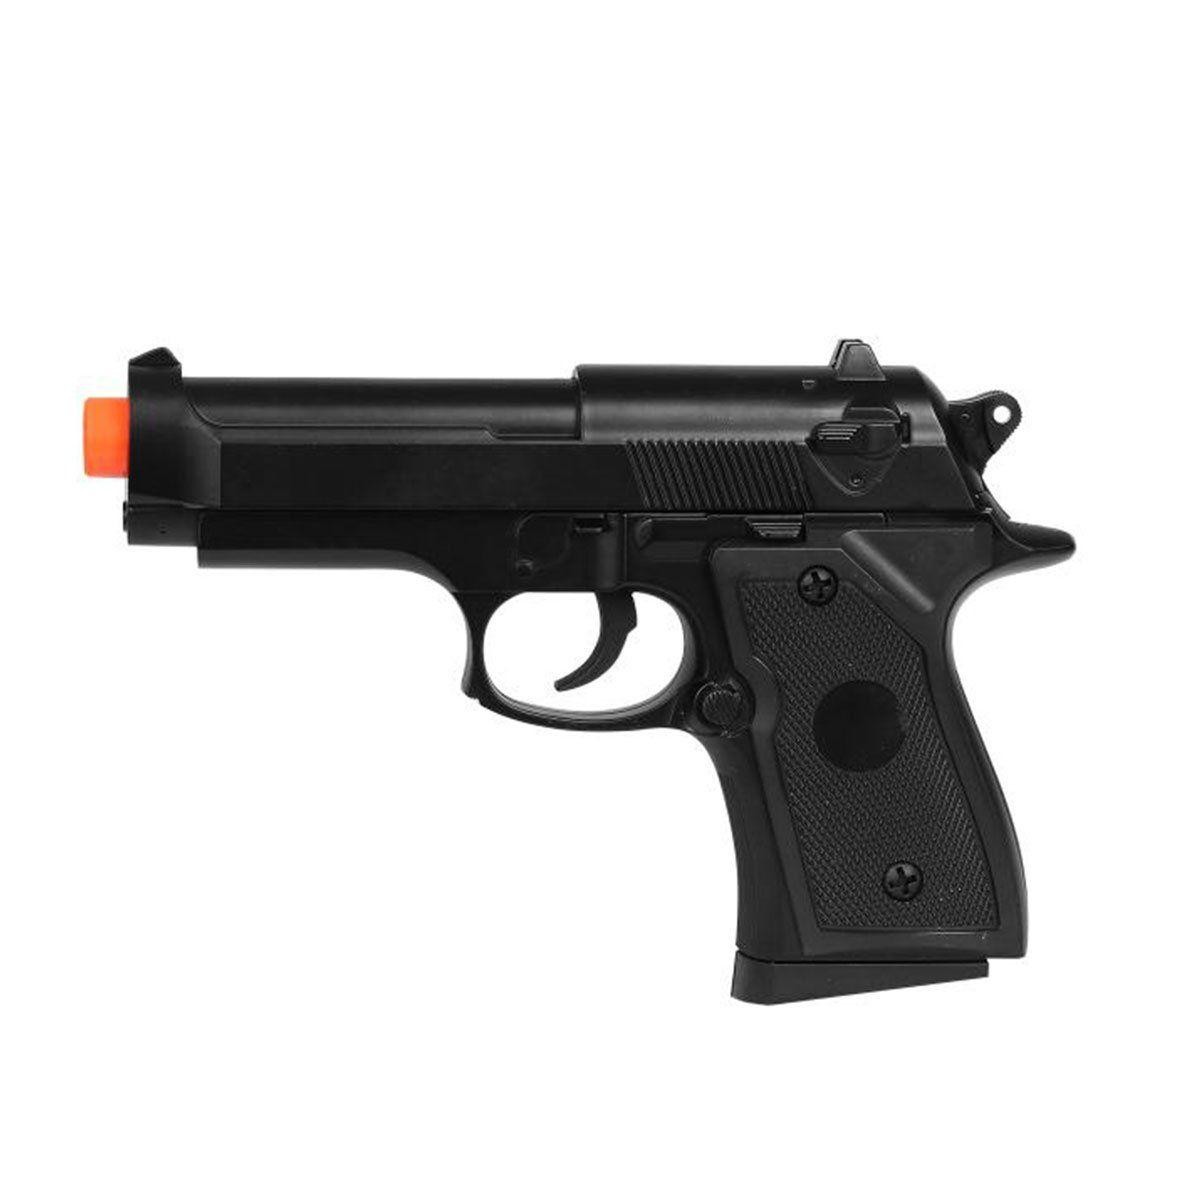 Pistola Airsoft Cyma ZM21 Beretta Full Metal Compact Spring